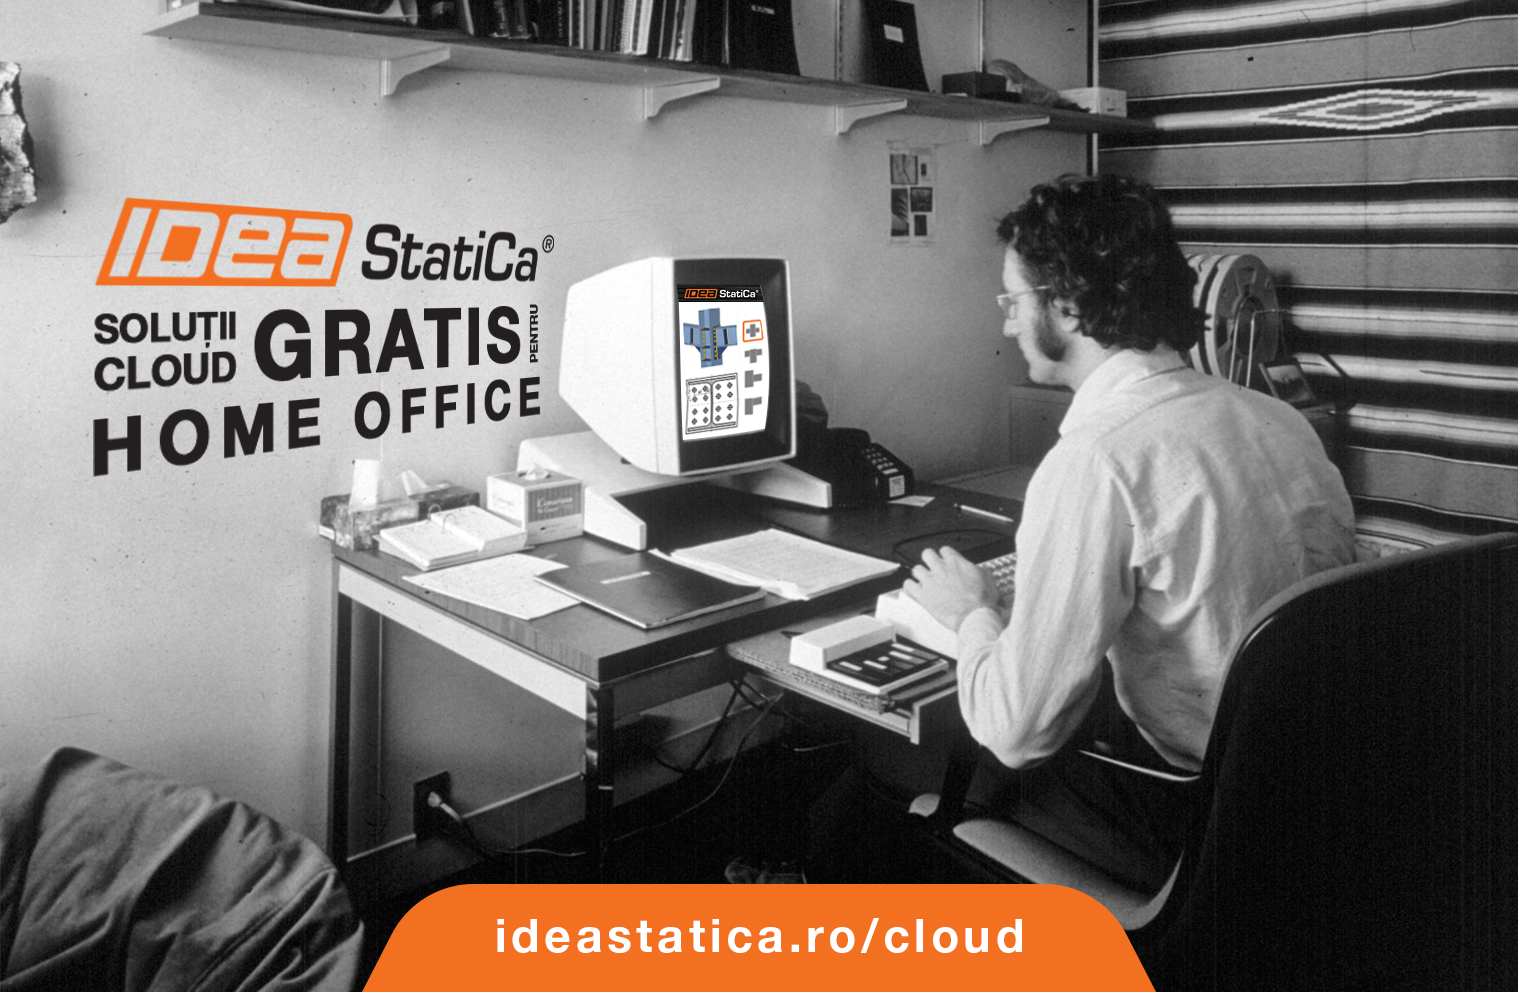 IDEA StatiCa cloud